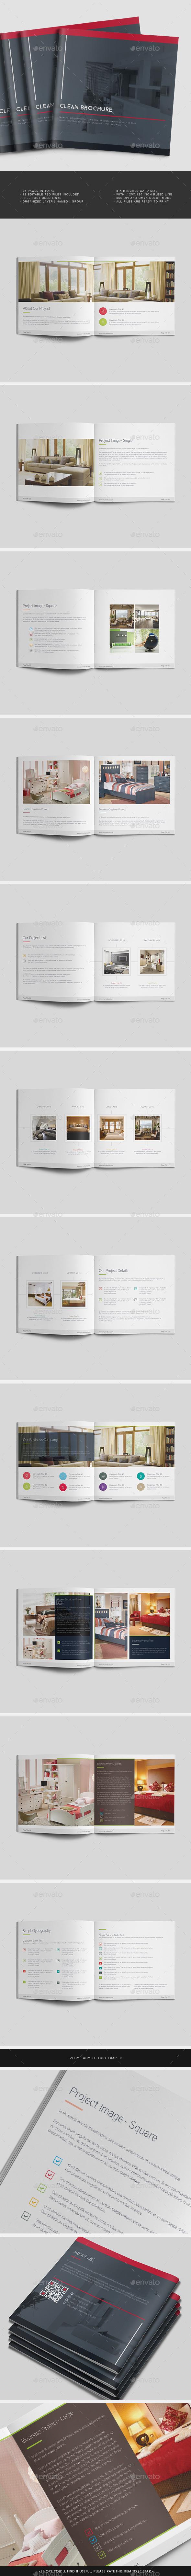 Square Portfolio Brochure V.3